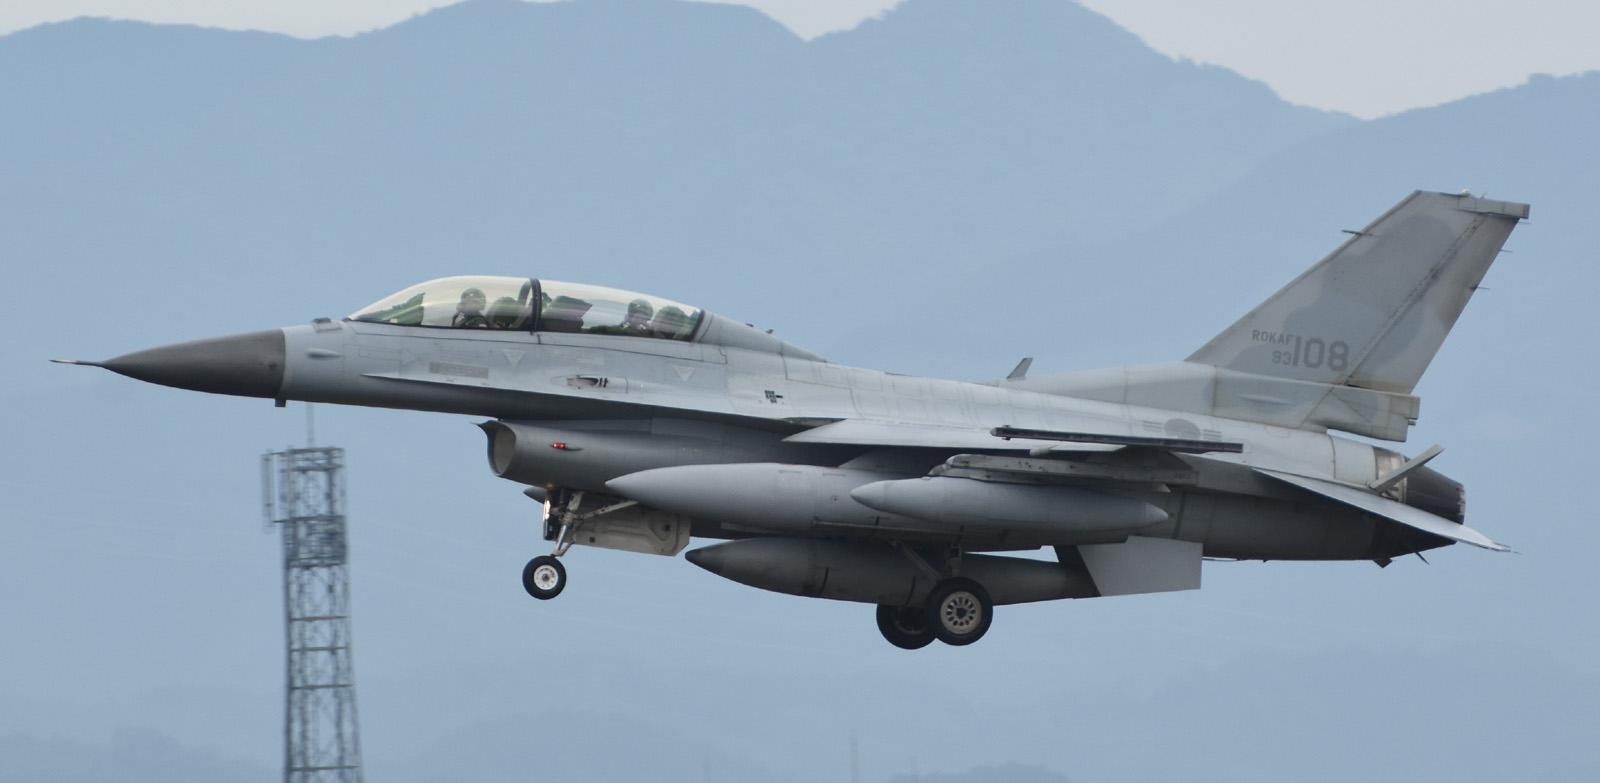 F16d170601g483